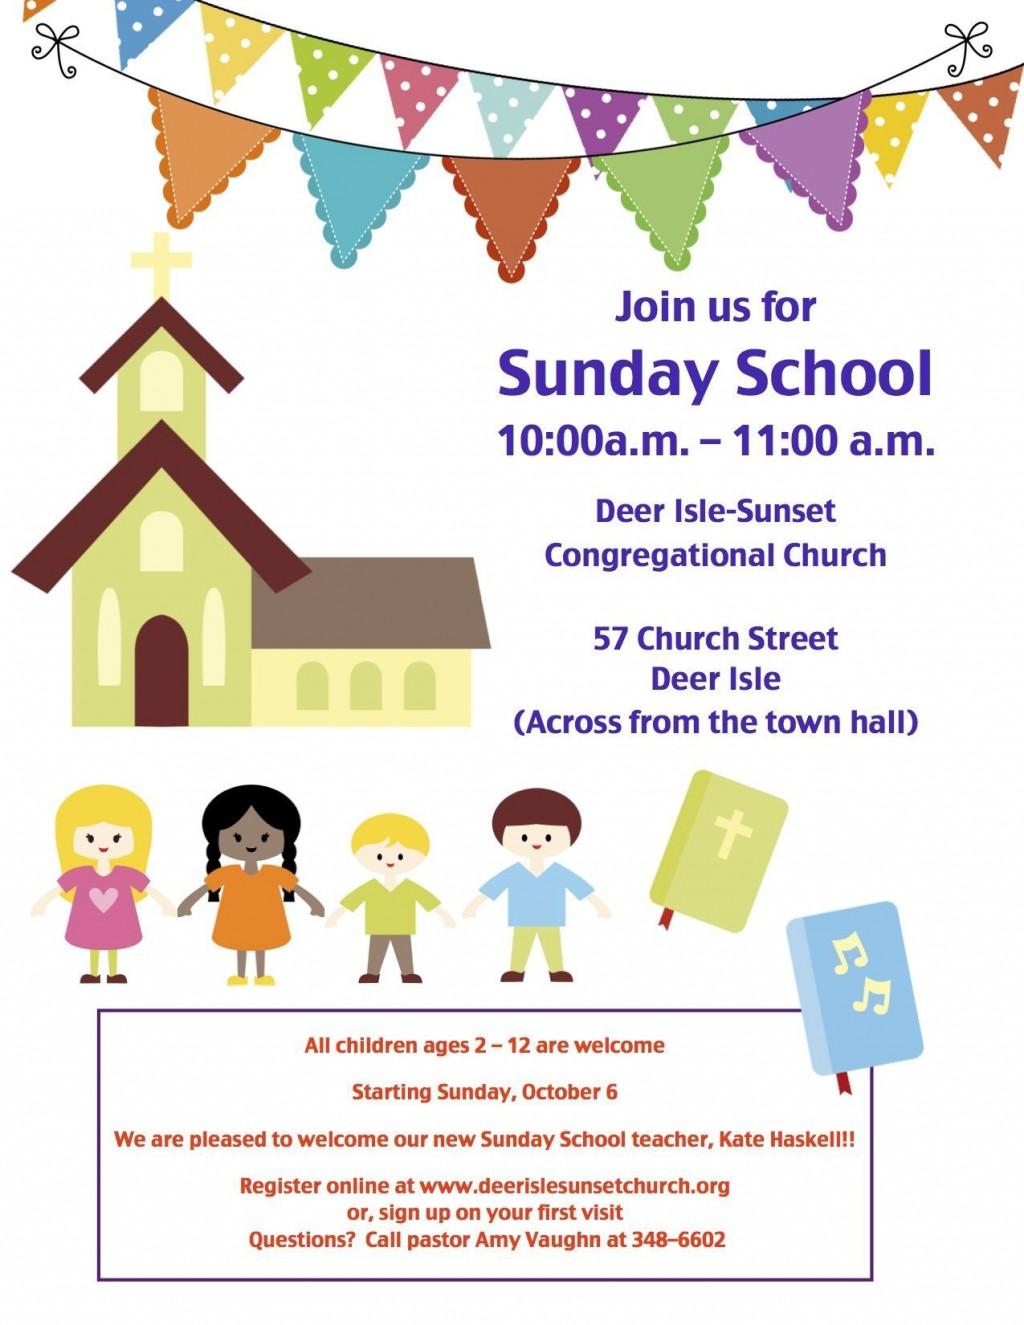 001 Unique Free Sunday School Flyer Template Photo  TemplatesLarge